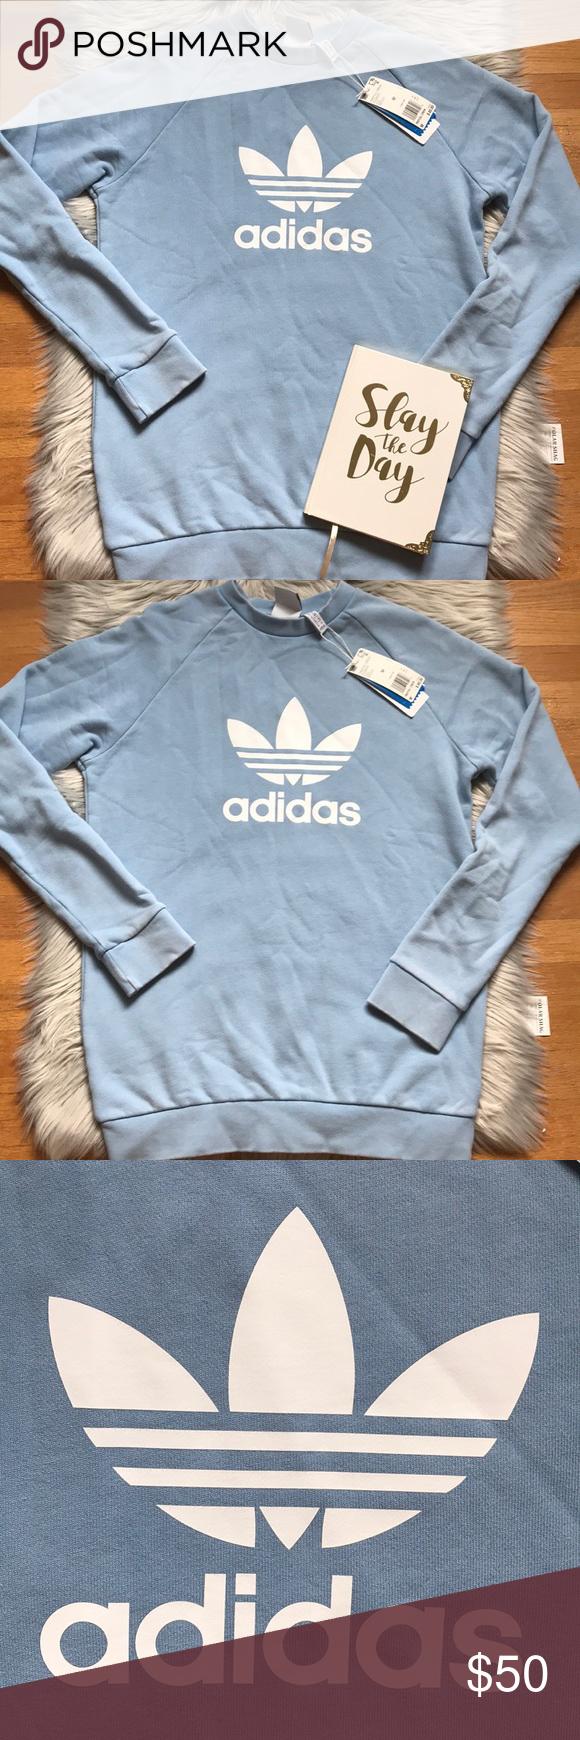 Nwt Adidas Light Blue Sweatshirt Light Blue Sweatshirt Adidas Sweatshirt Blue Adidas [ 1740 x 580 Pixel ]